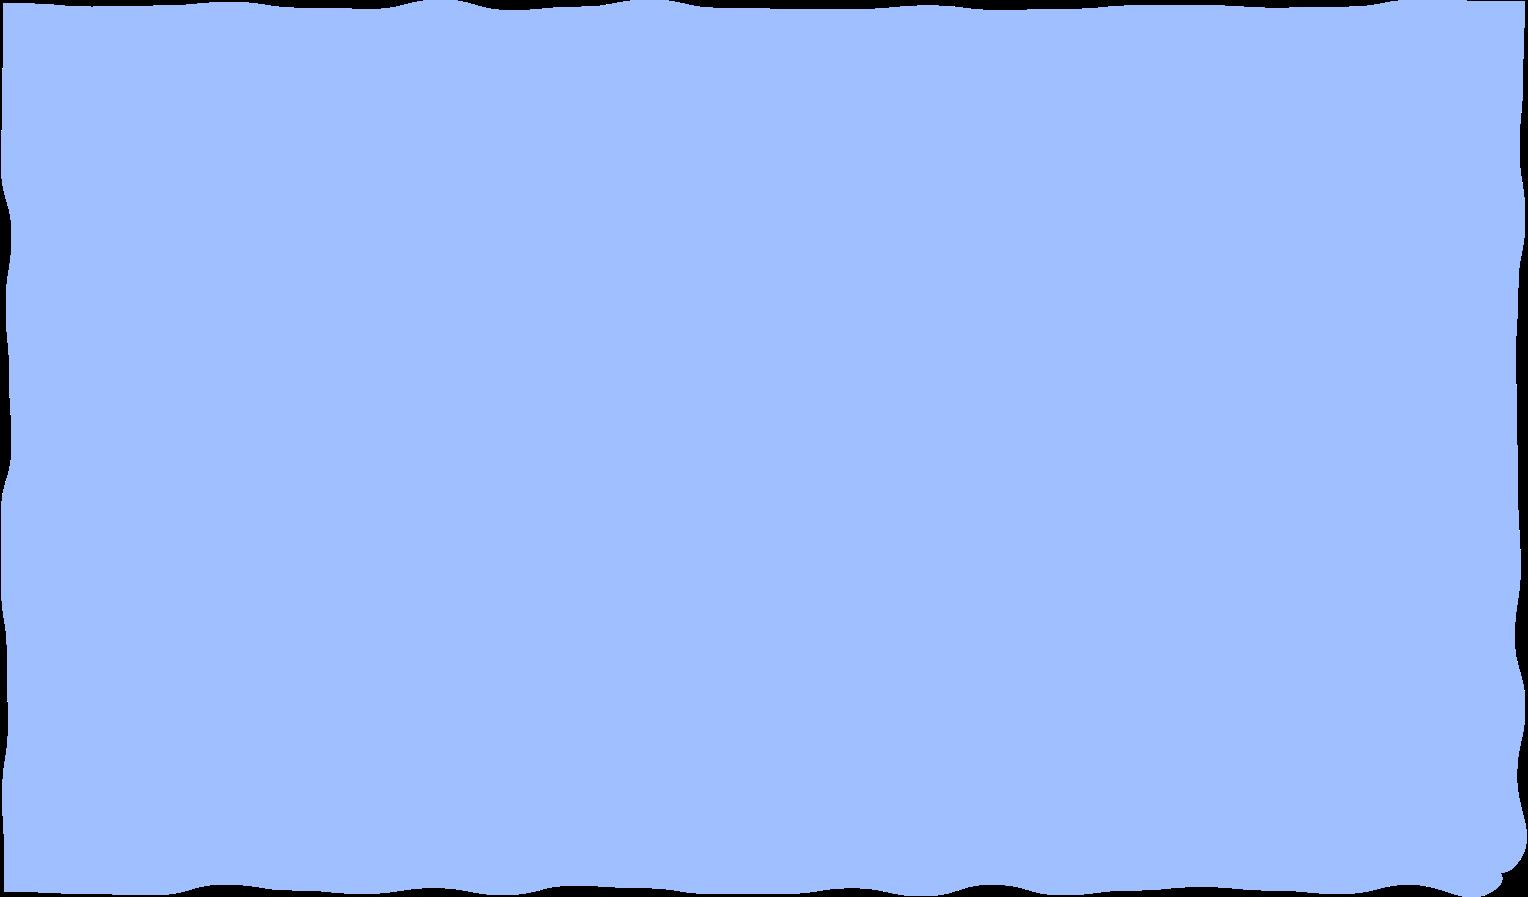 rectangle light blue Clipart illustration in PNG, SVG